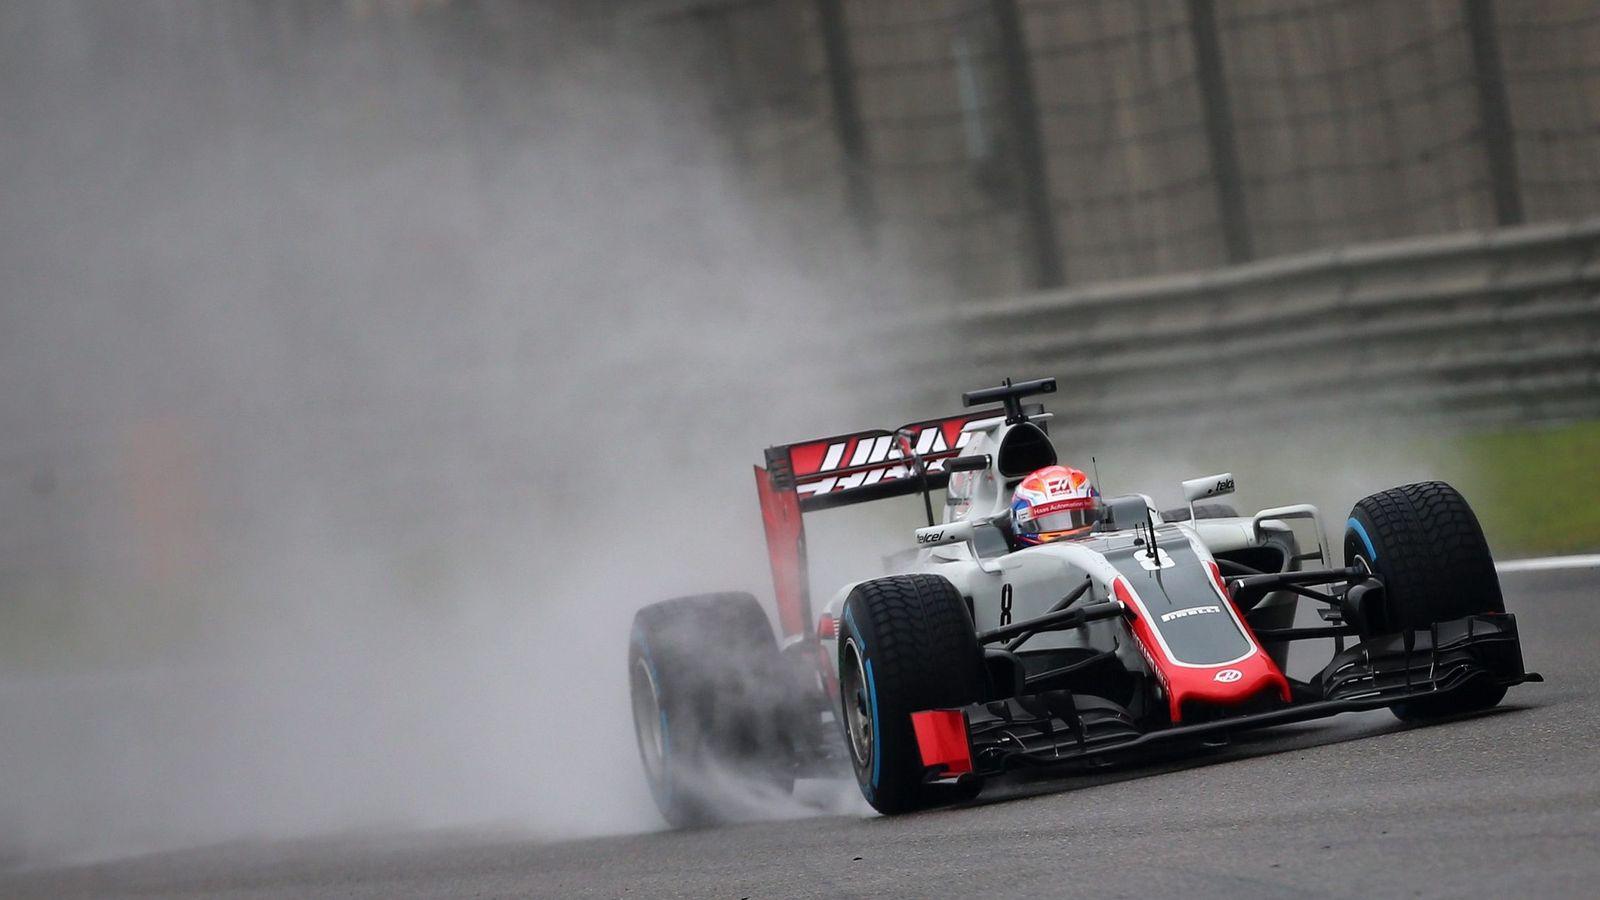 Foto: El Haas de Grosjean sobre el asfalto de Shanghai.